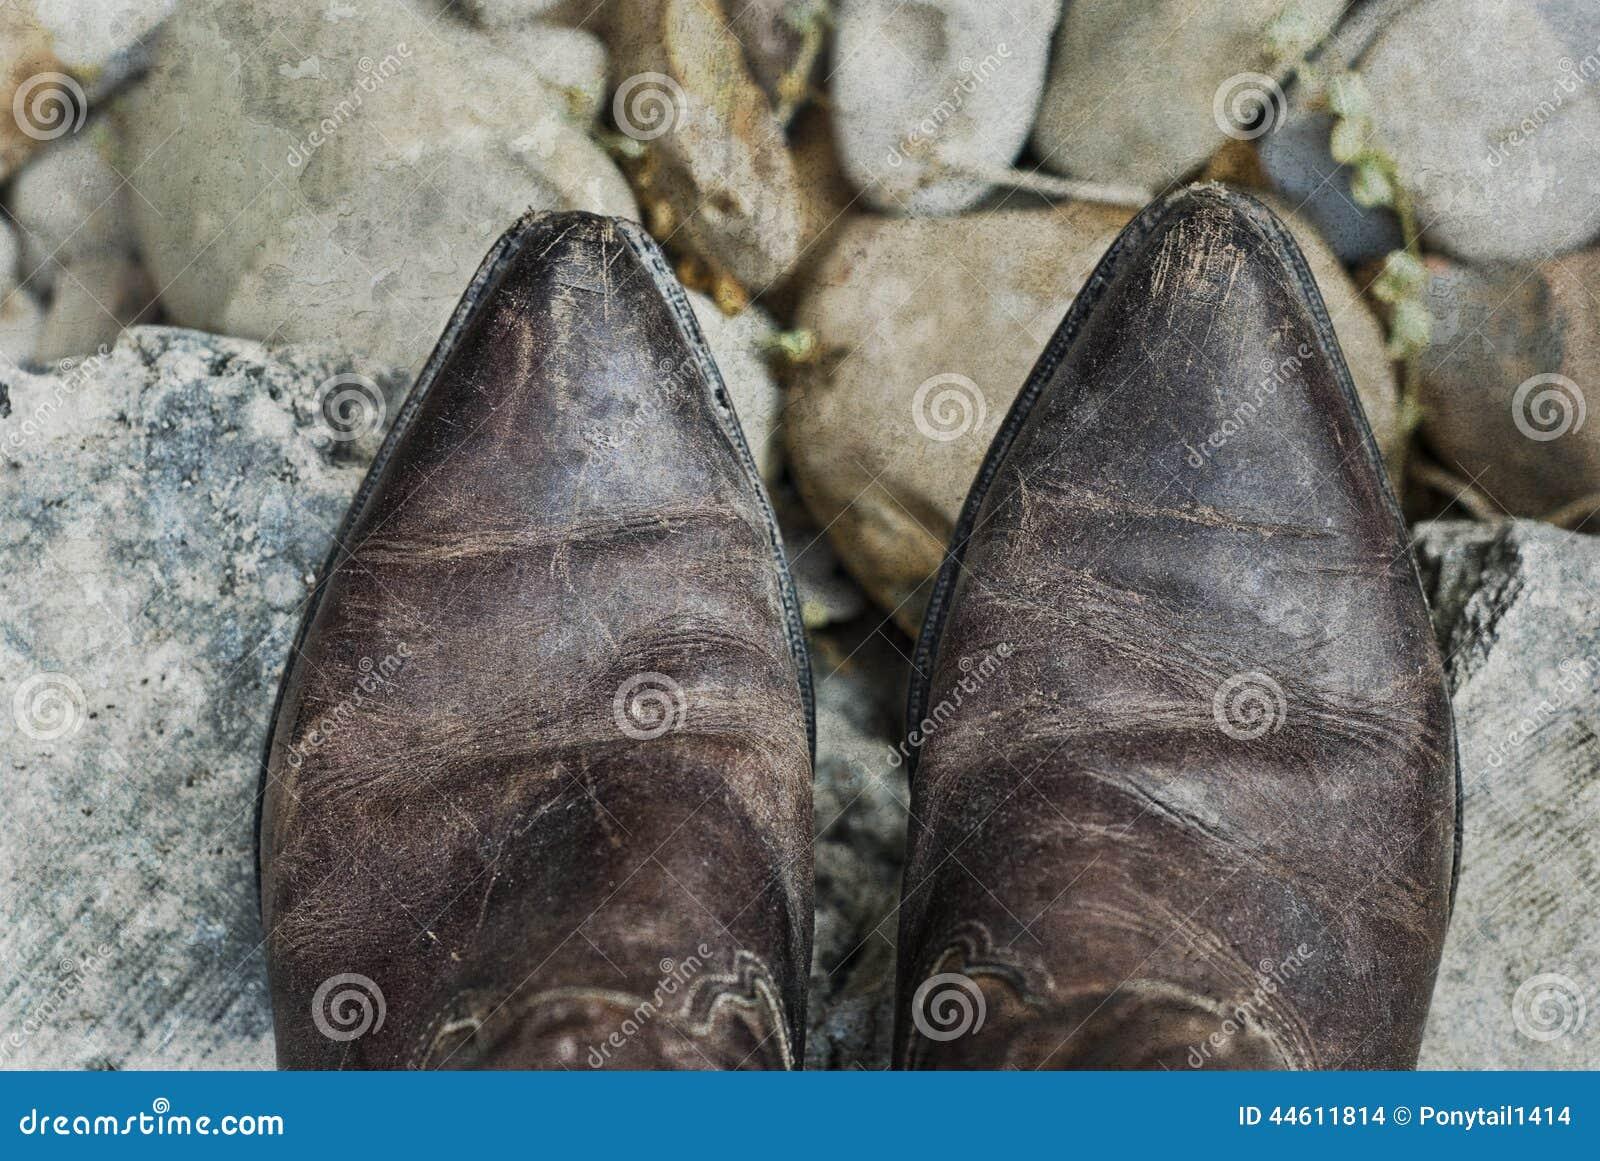 Grunge Cowboy Boots Stock Photo - Image: 44611814